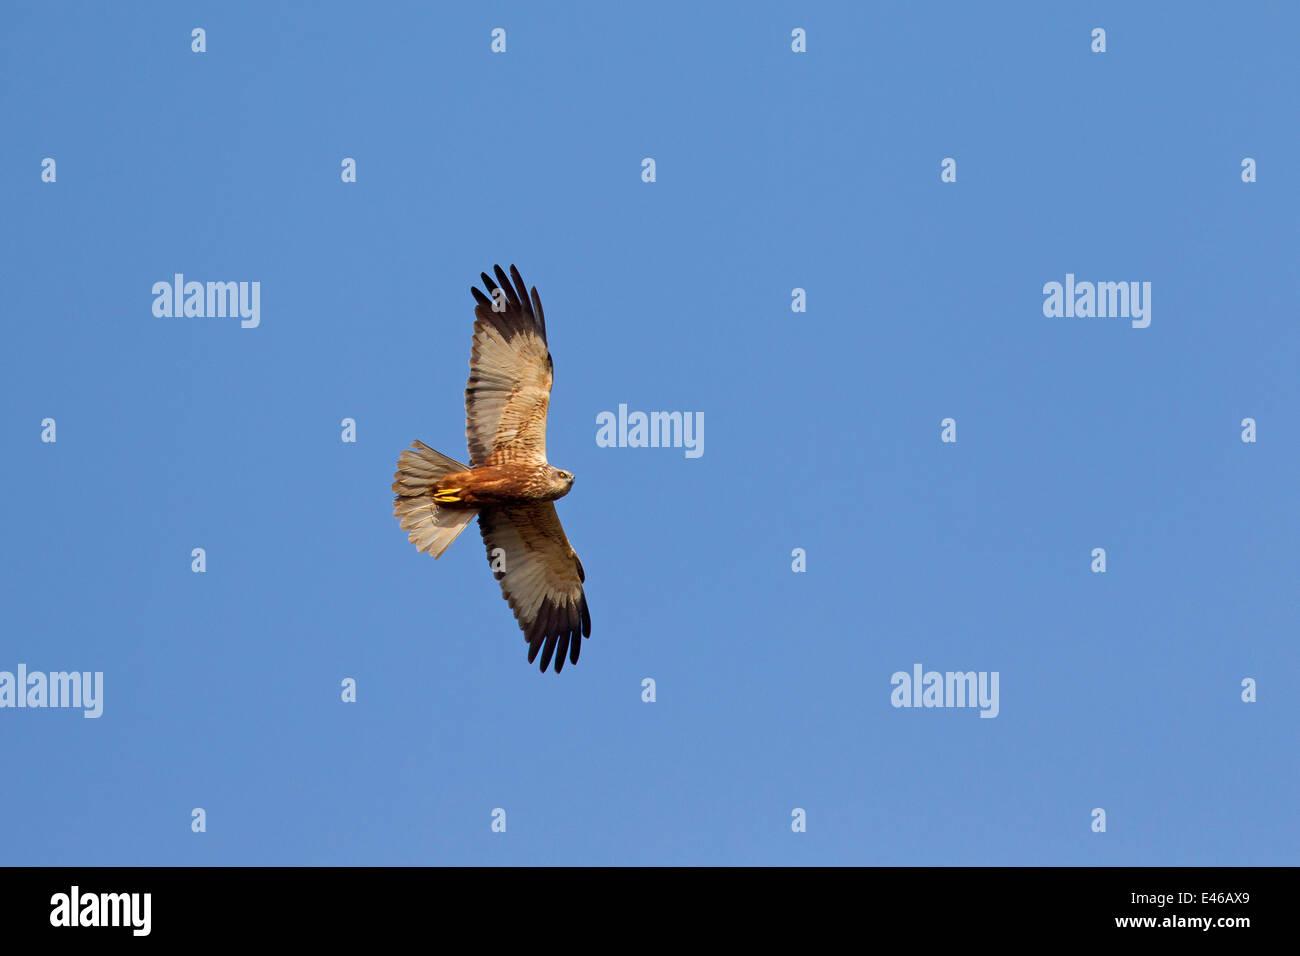 Western marsh harrier / Eurasian marsh harrier (Circus aeruginosus), male in flight against blue sky Stock Photo